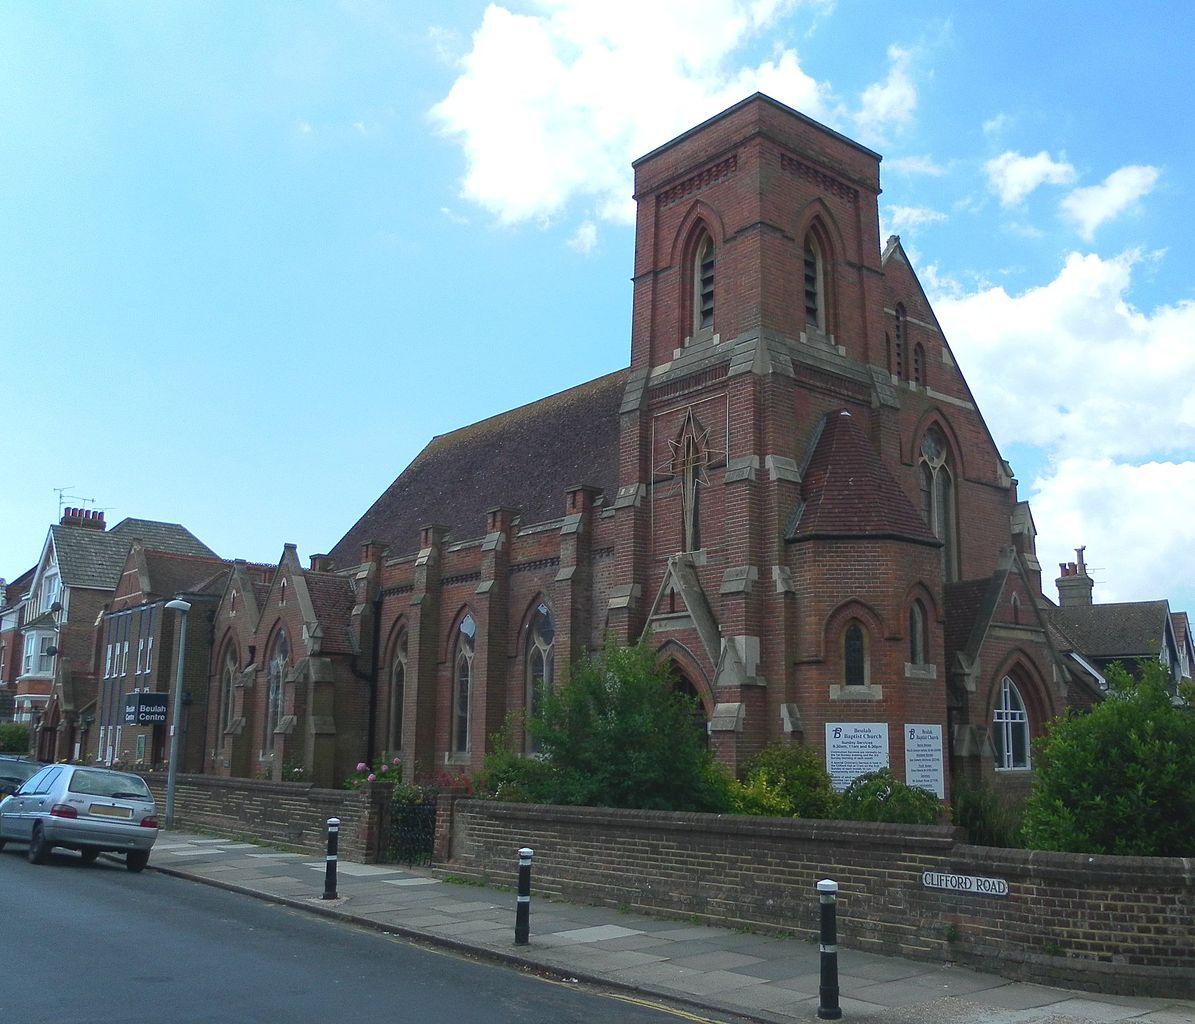 File:Beulah Baptist Church, Bexhill.JPG - Wikipedia